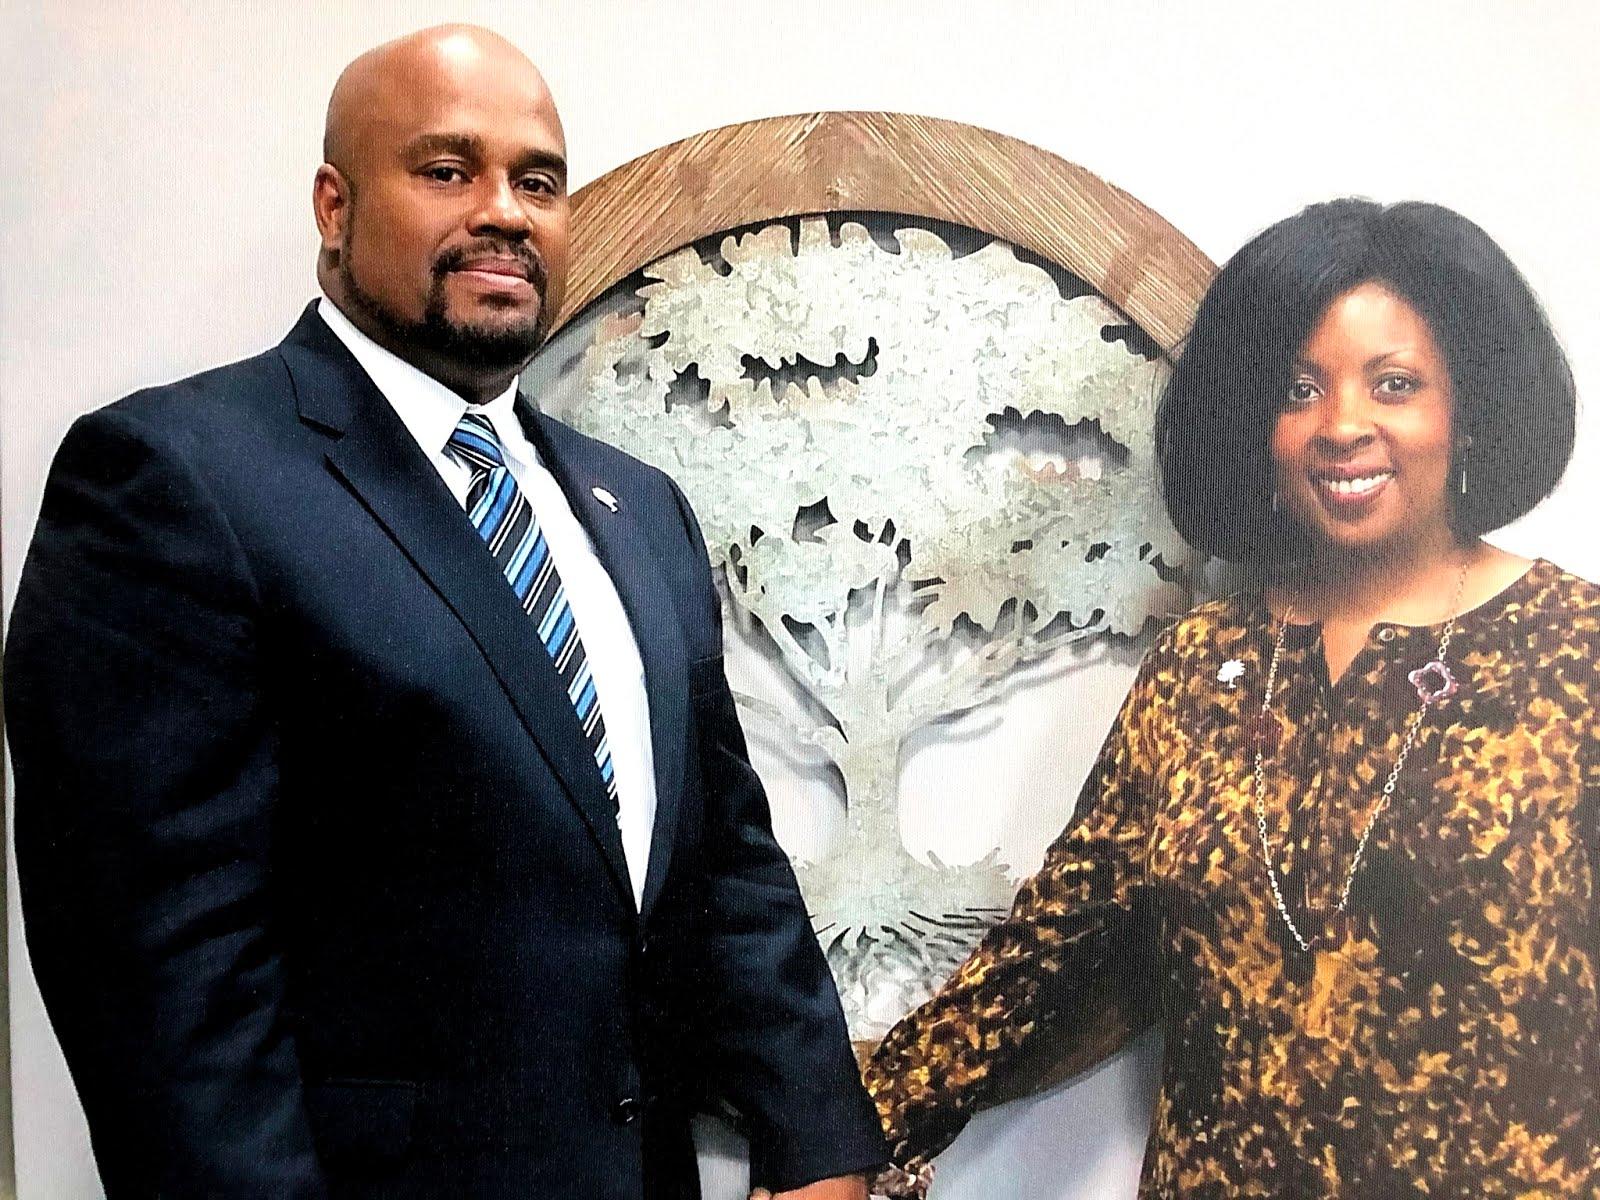 Bishop Shawn and First Lady Tasha Davis